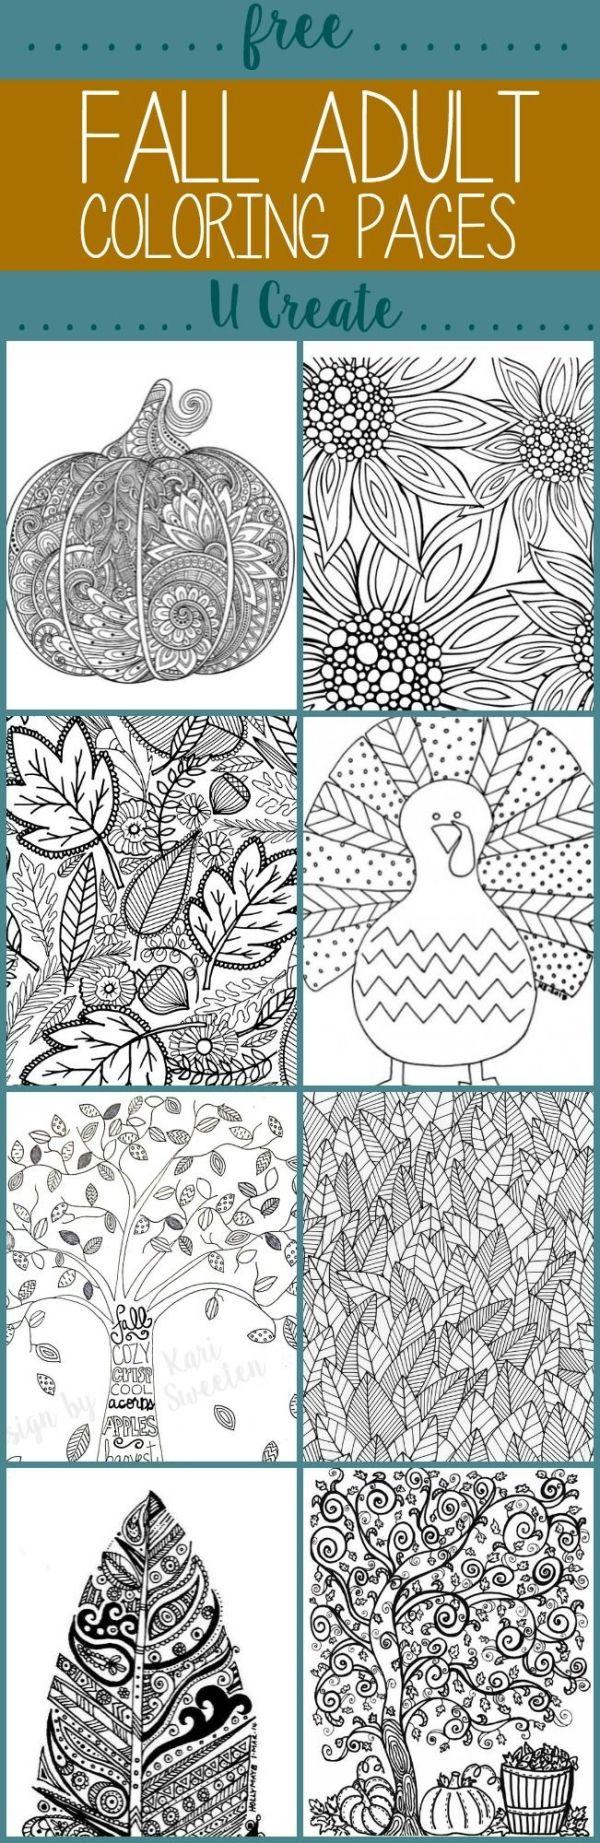 J words coloring pages - 23 Best Coloring Pages Images On Pinterest Coloring Books Coloring Sheets And Mandalas